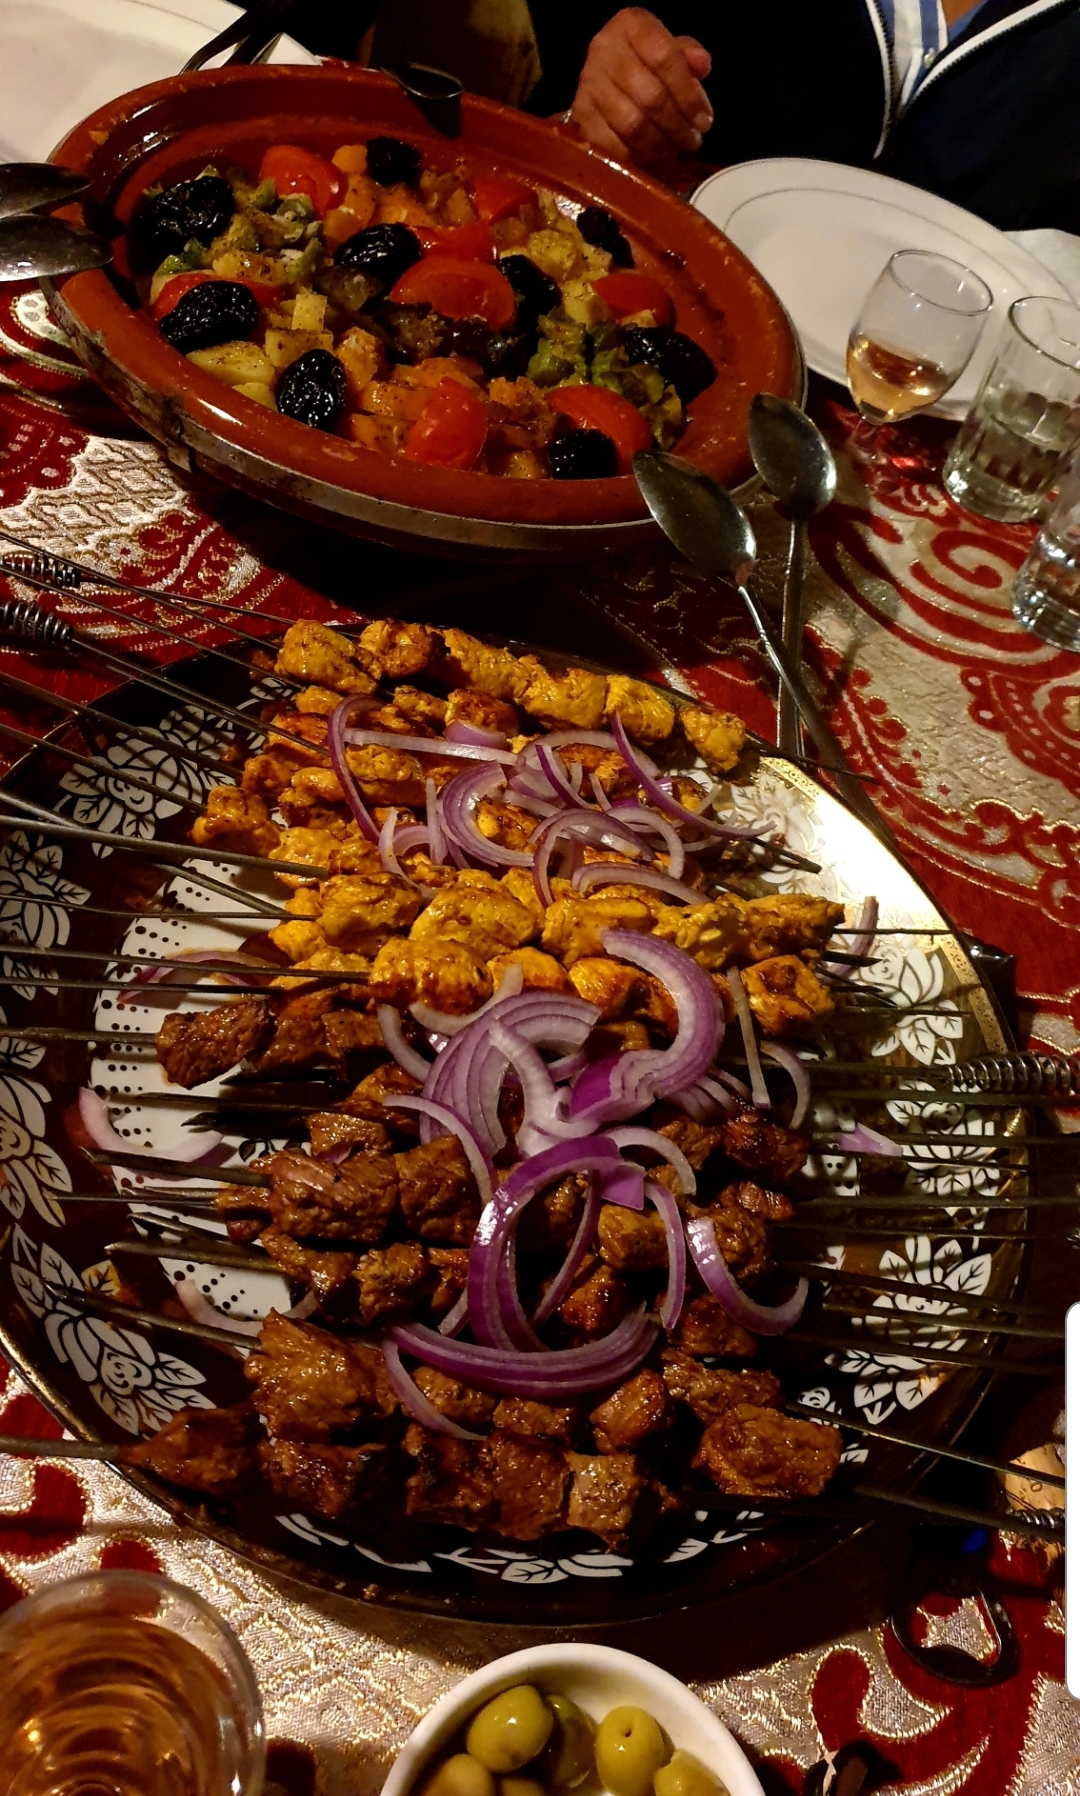 Salade Marocaine, oignons rouges et brochettes